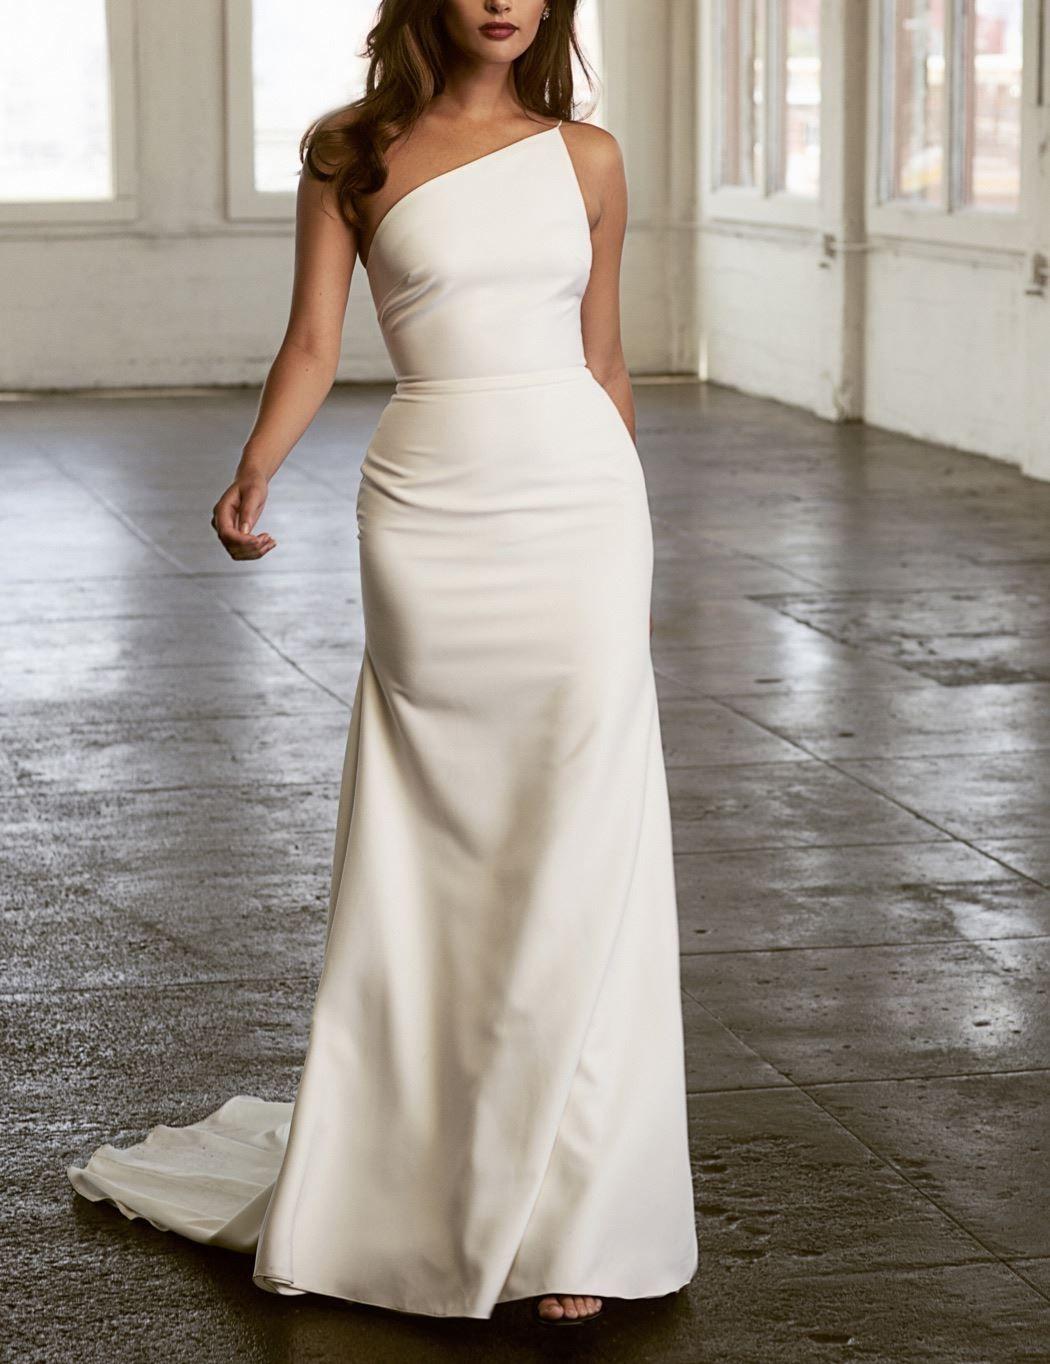 Sarah Seven Cindi One Shoulder Wedding Gown At Lovely Bride One Shoulder Wedding Gowns Wedding Dresses Modern Wedding Dress